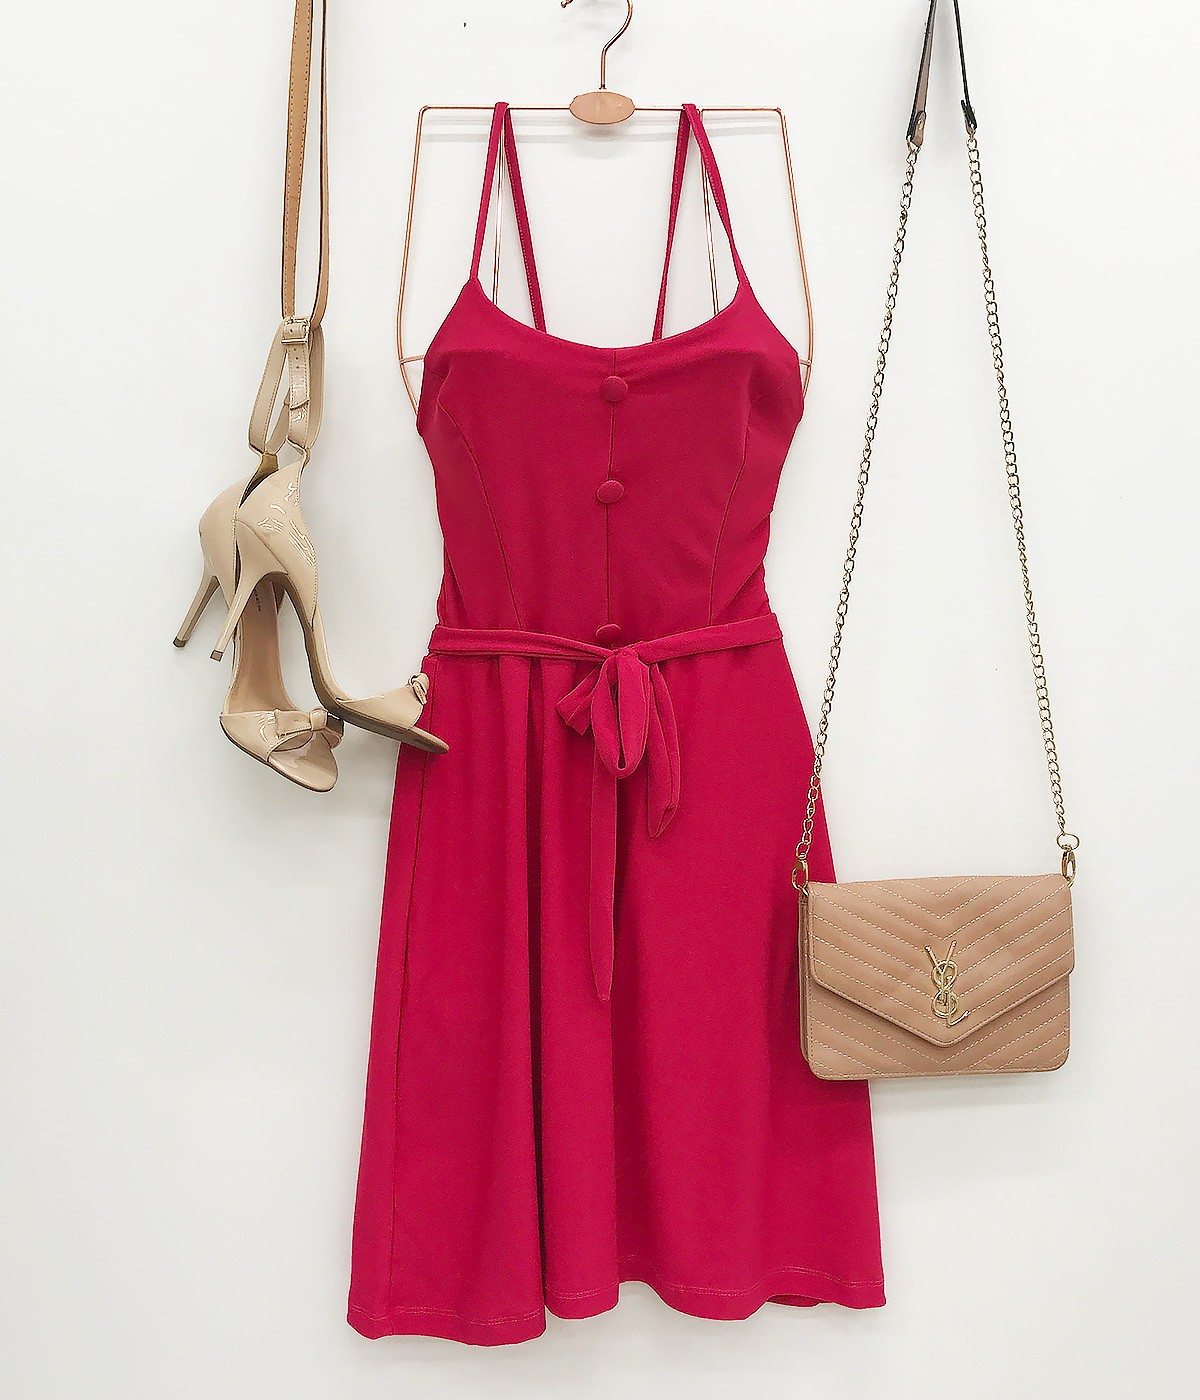 Vestido Compra Que Da Sorte